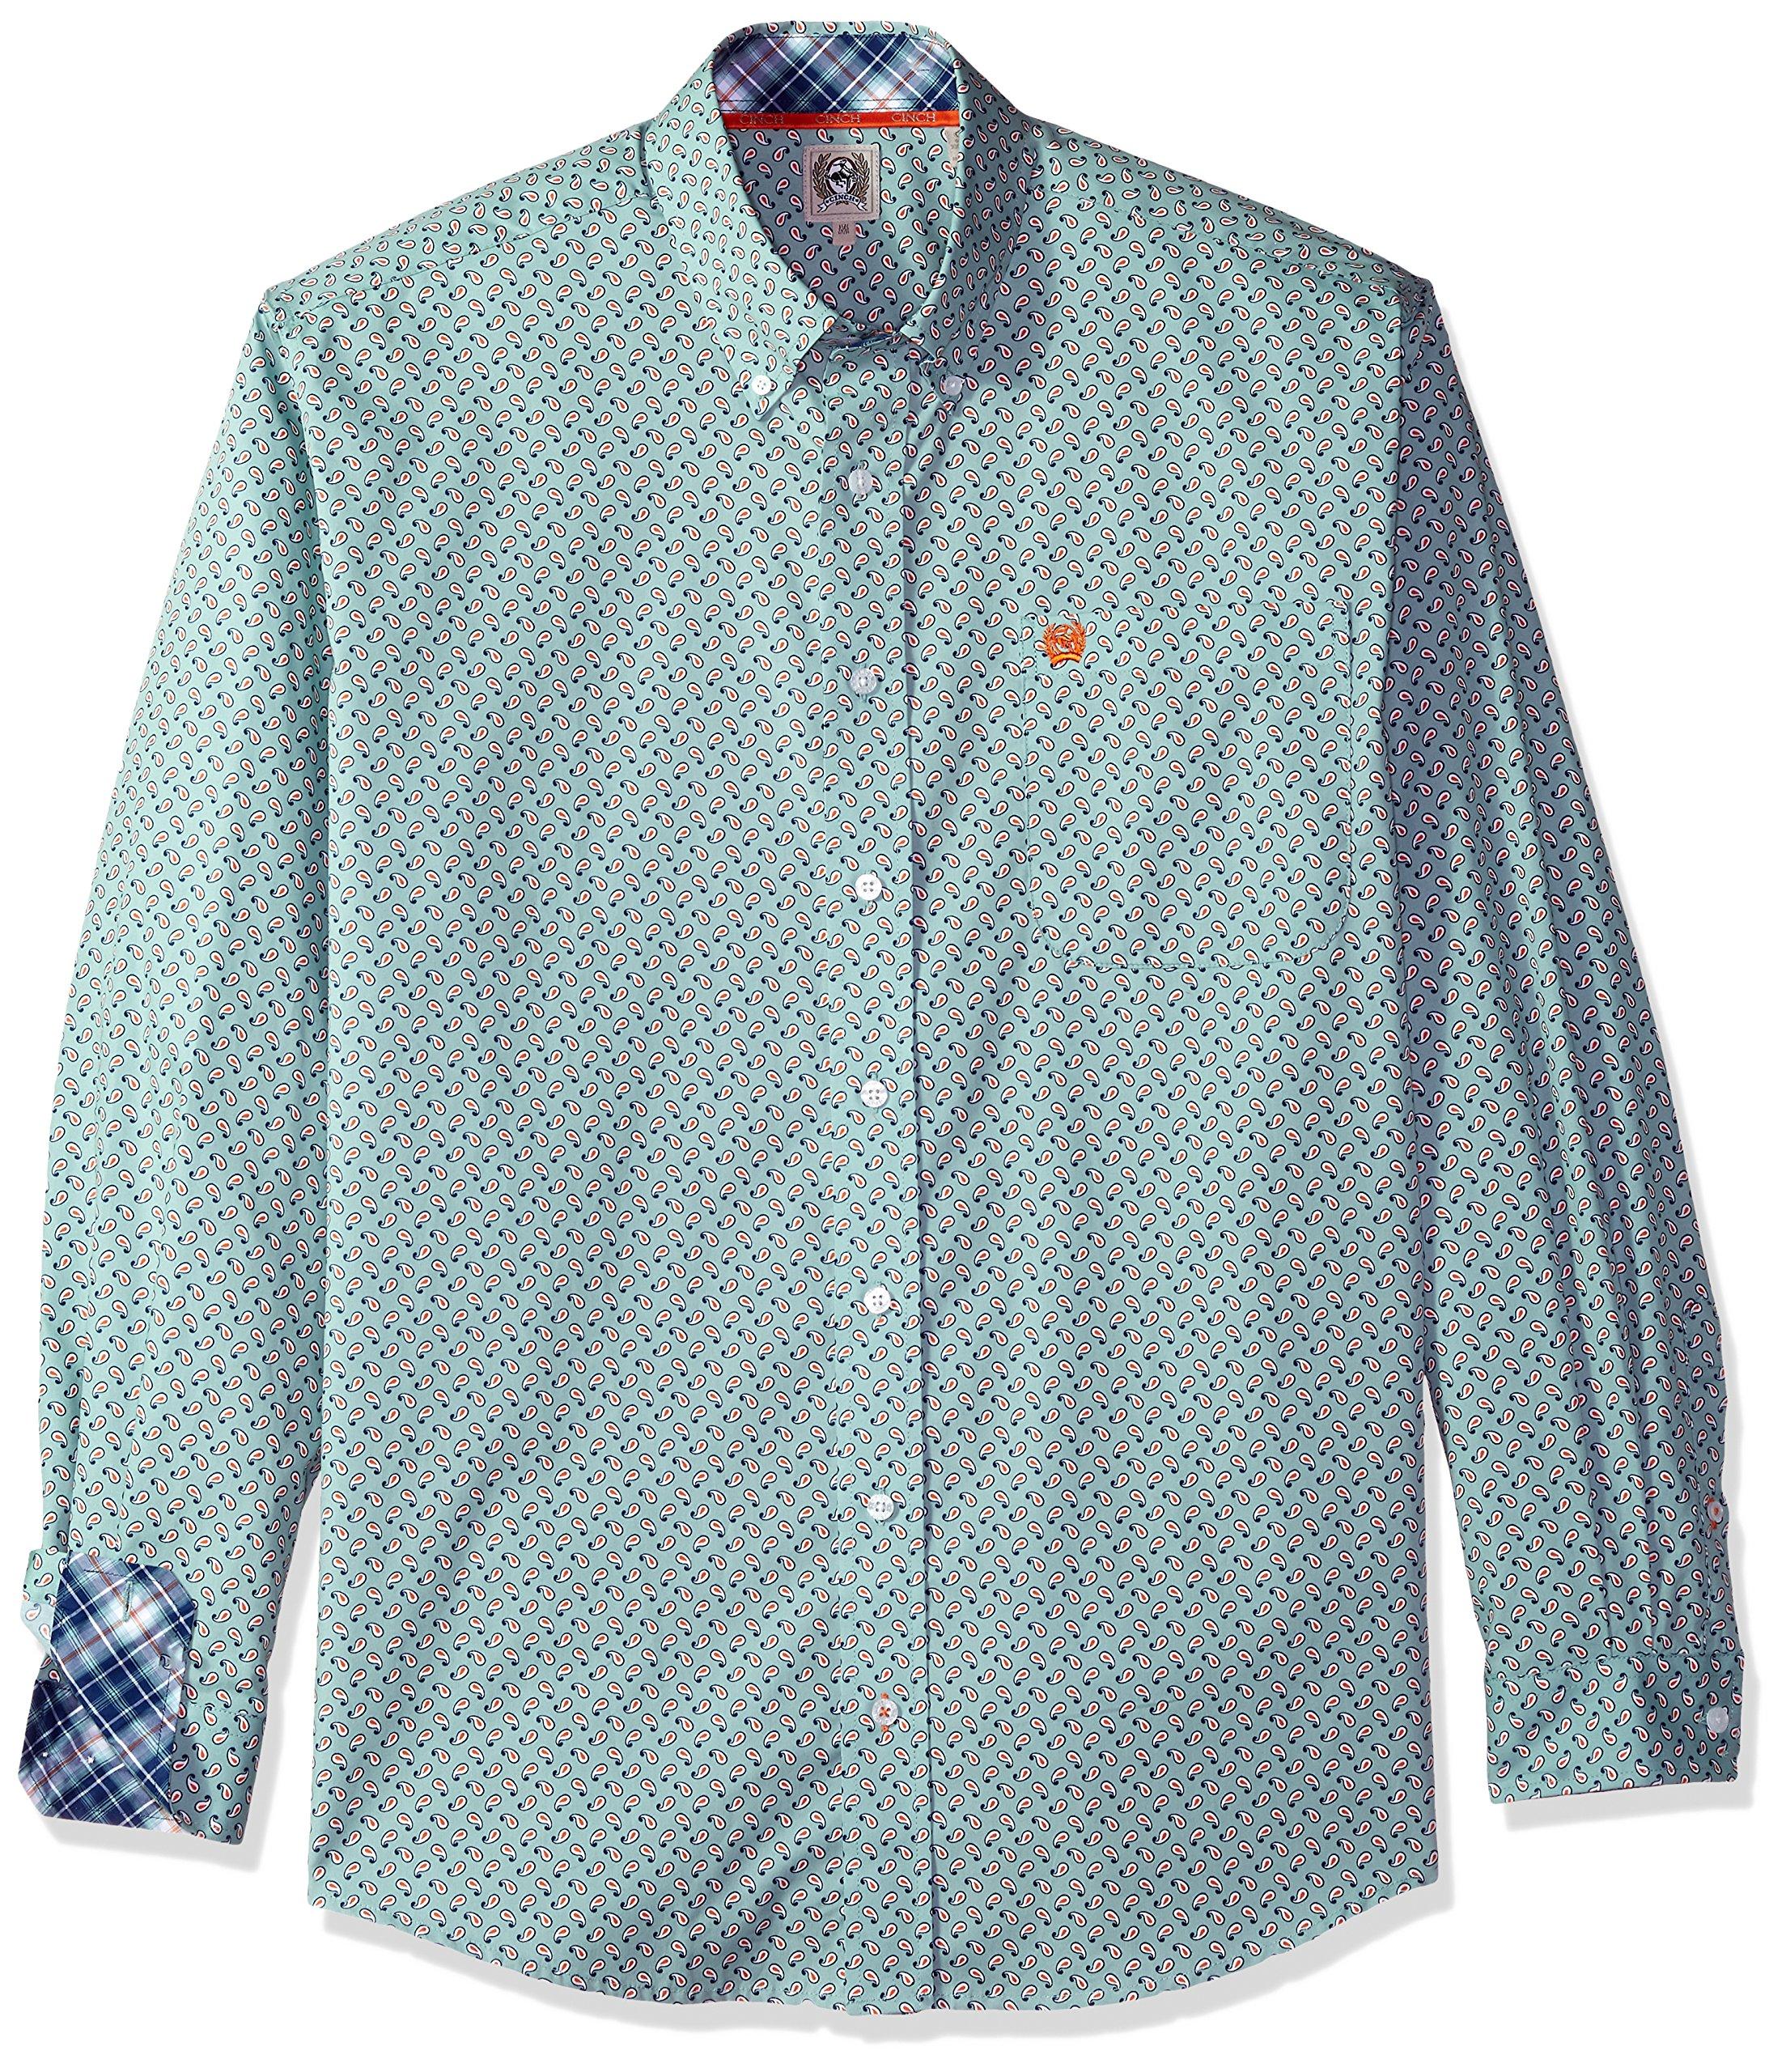 Cinch Men's Classic Fit Long Sleeve Button One Open Pocket Print Shirt, Light Blue Paisley, M